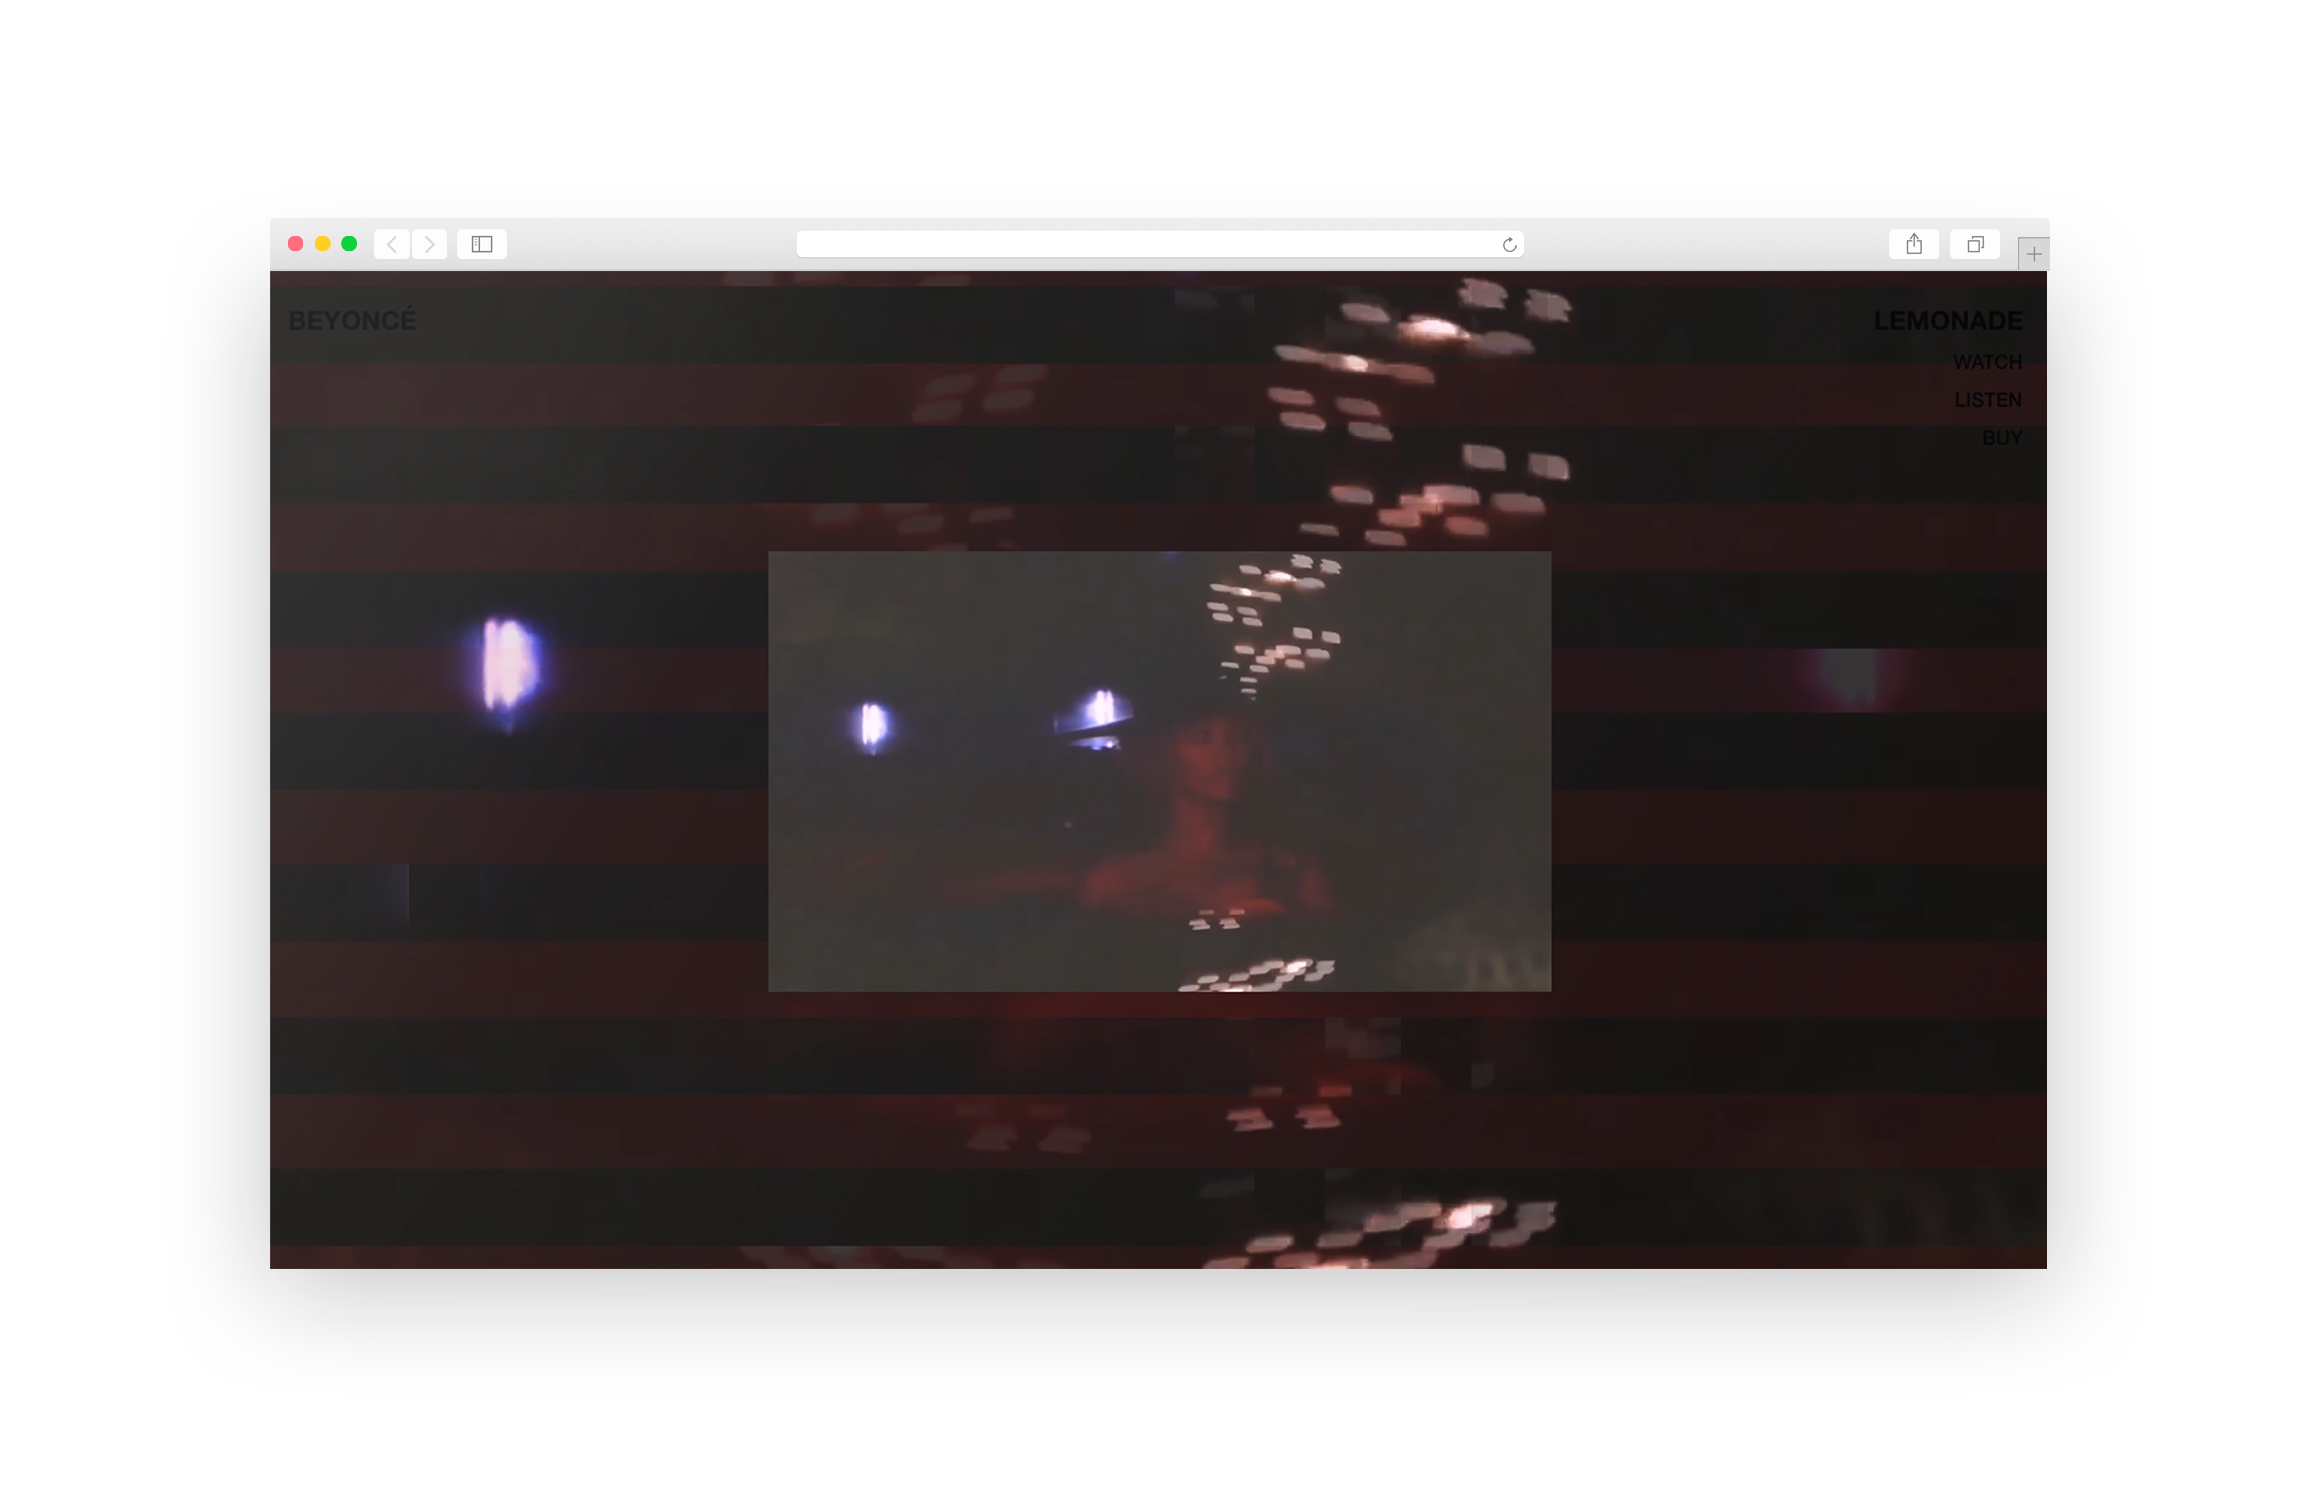 distortion_08.jpg